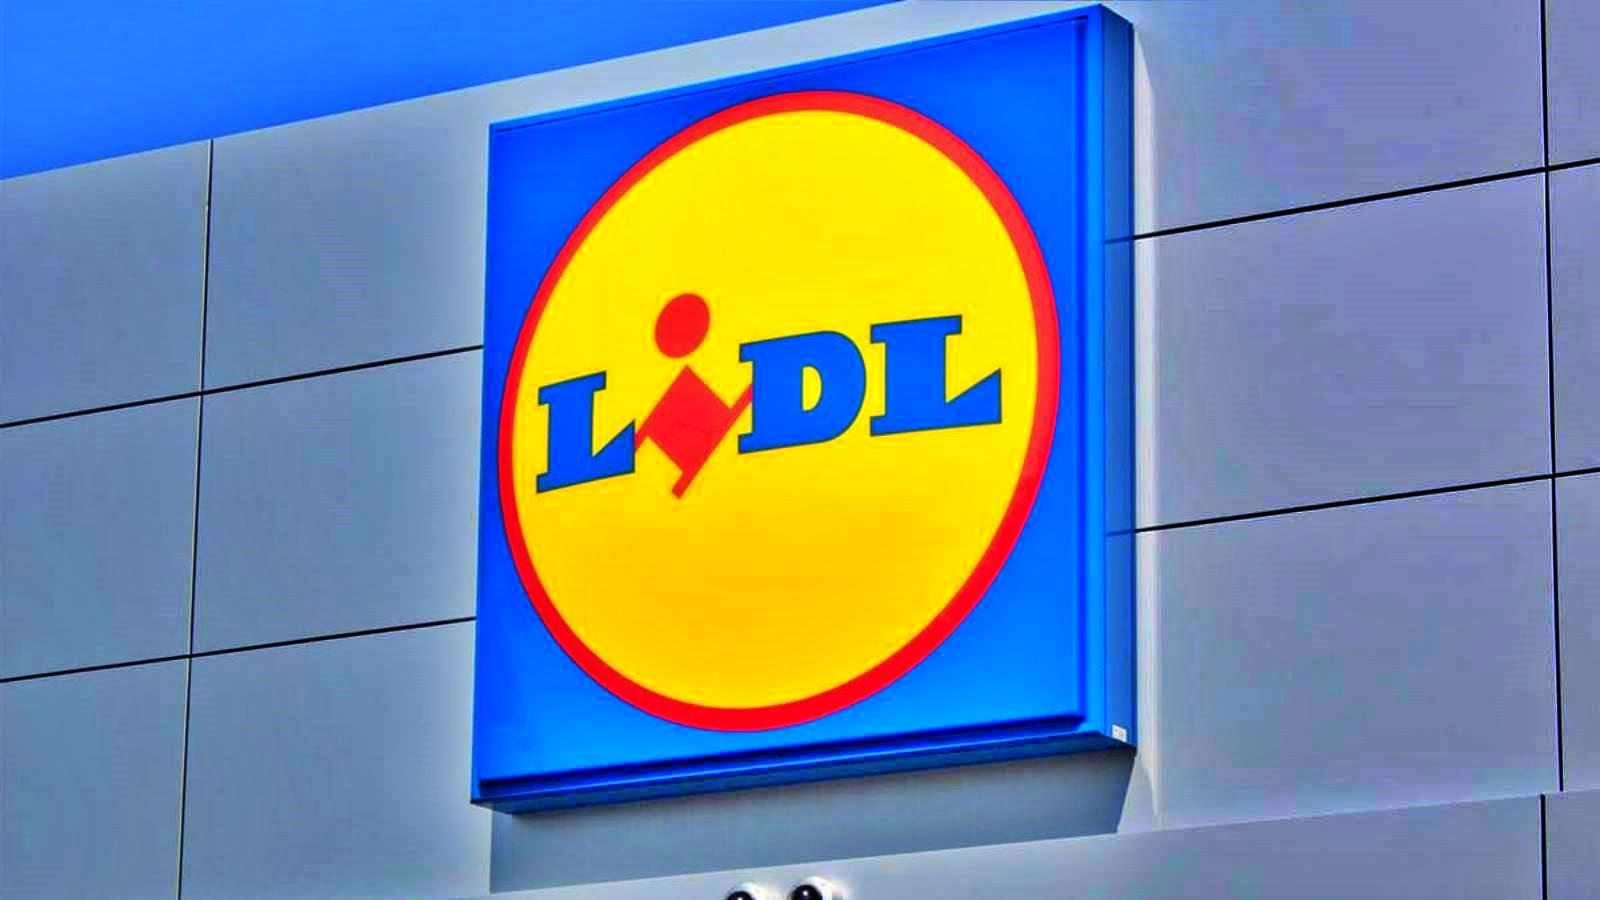 LIDL Romania instant